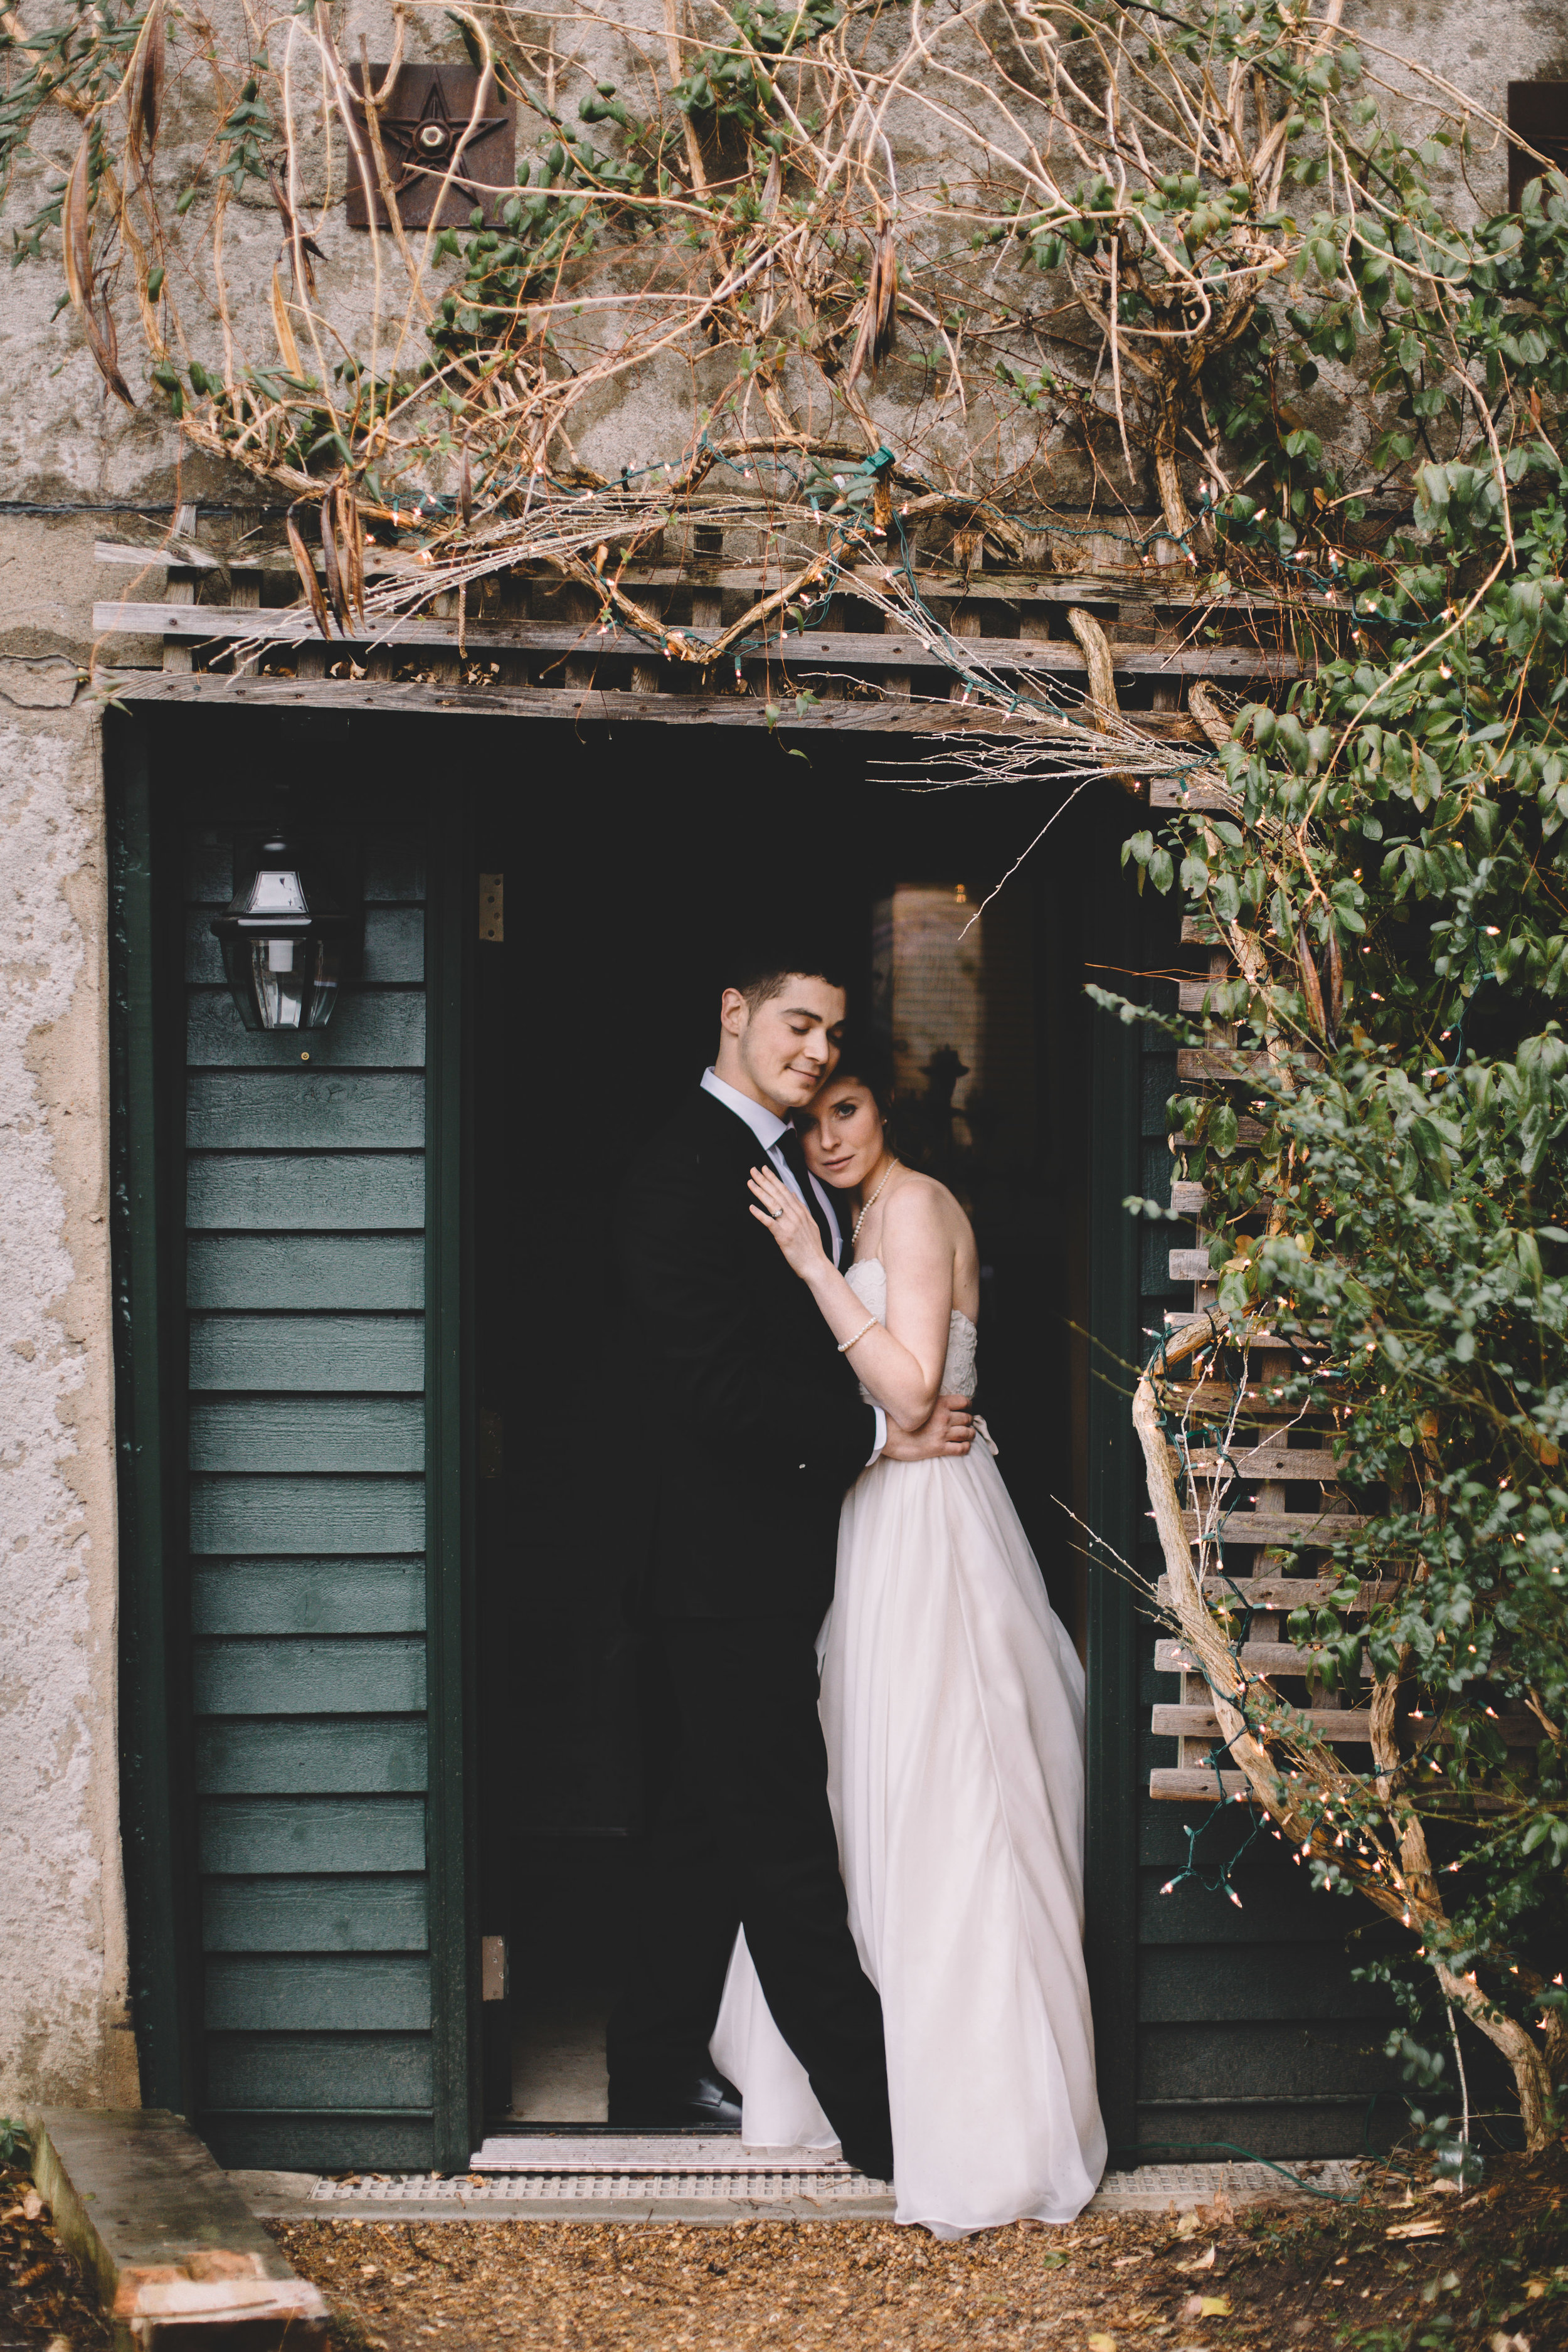 Jake + Brittney Balbas Airbnb Carriage House Wedding Evansville IN (104 of 426).jpg